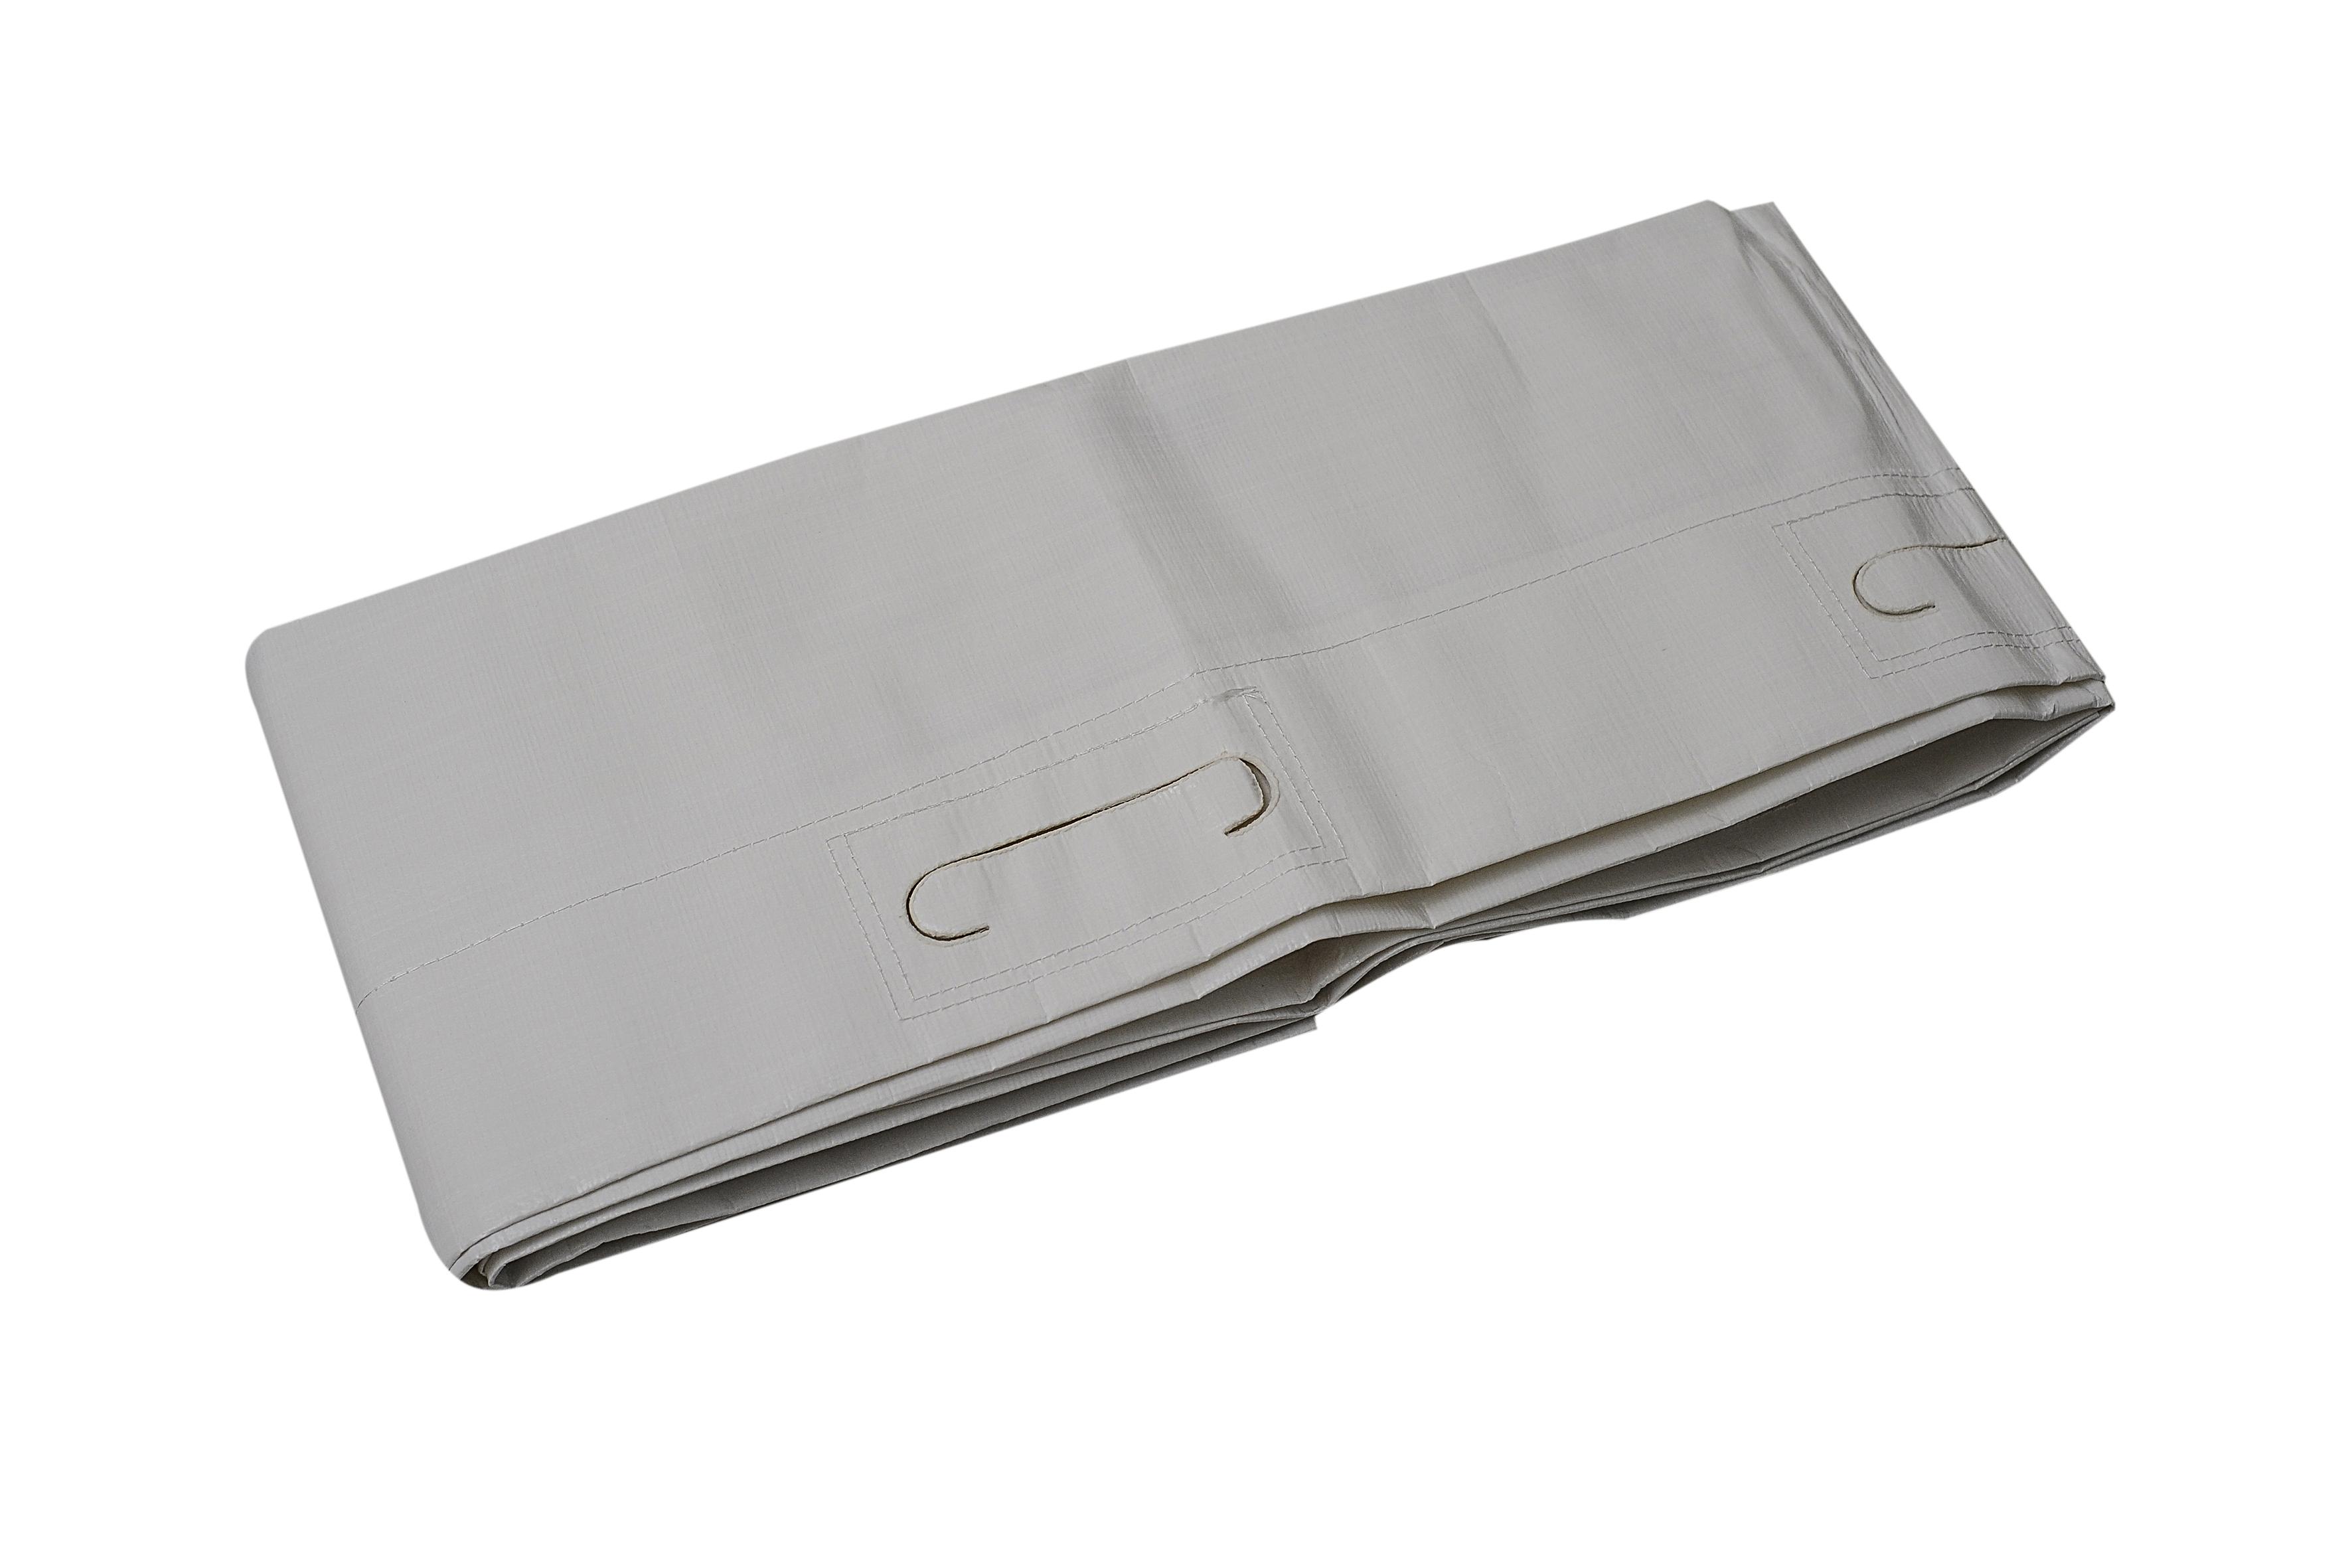 Einweg-Rettungstuch, weiß, 200 x 70 cm